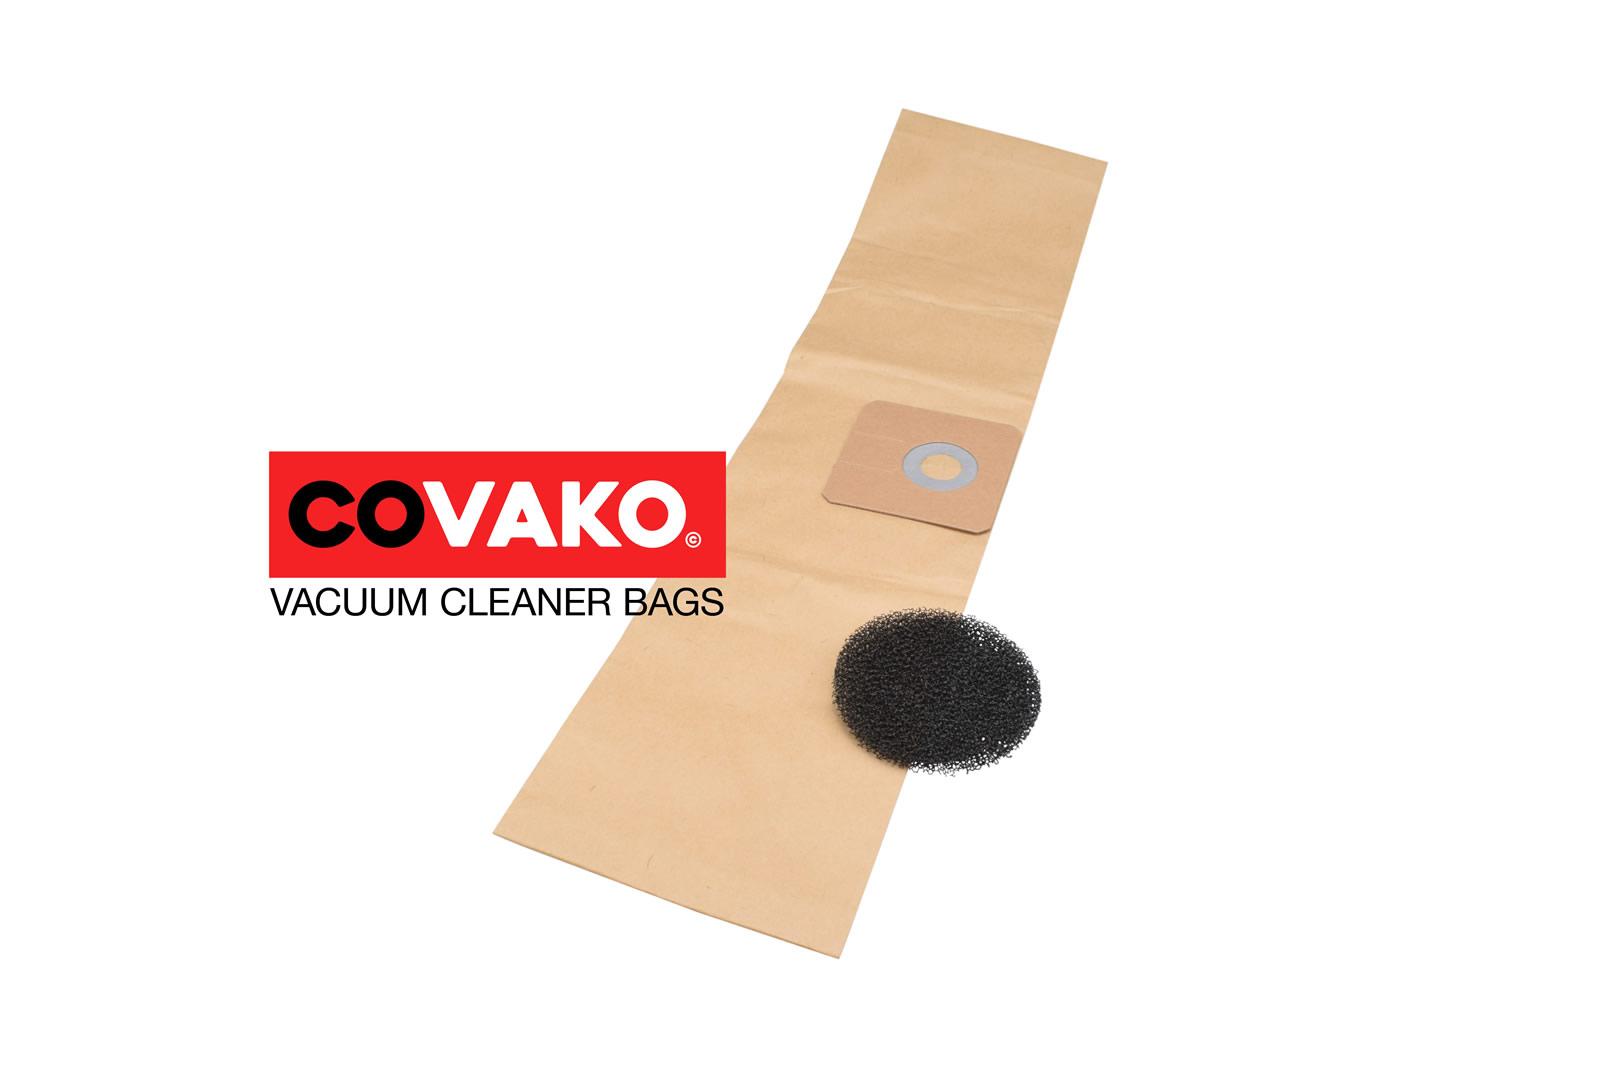 bluematic VC 14 Hepa / Papier - bluematic stofzuigerzakken